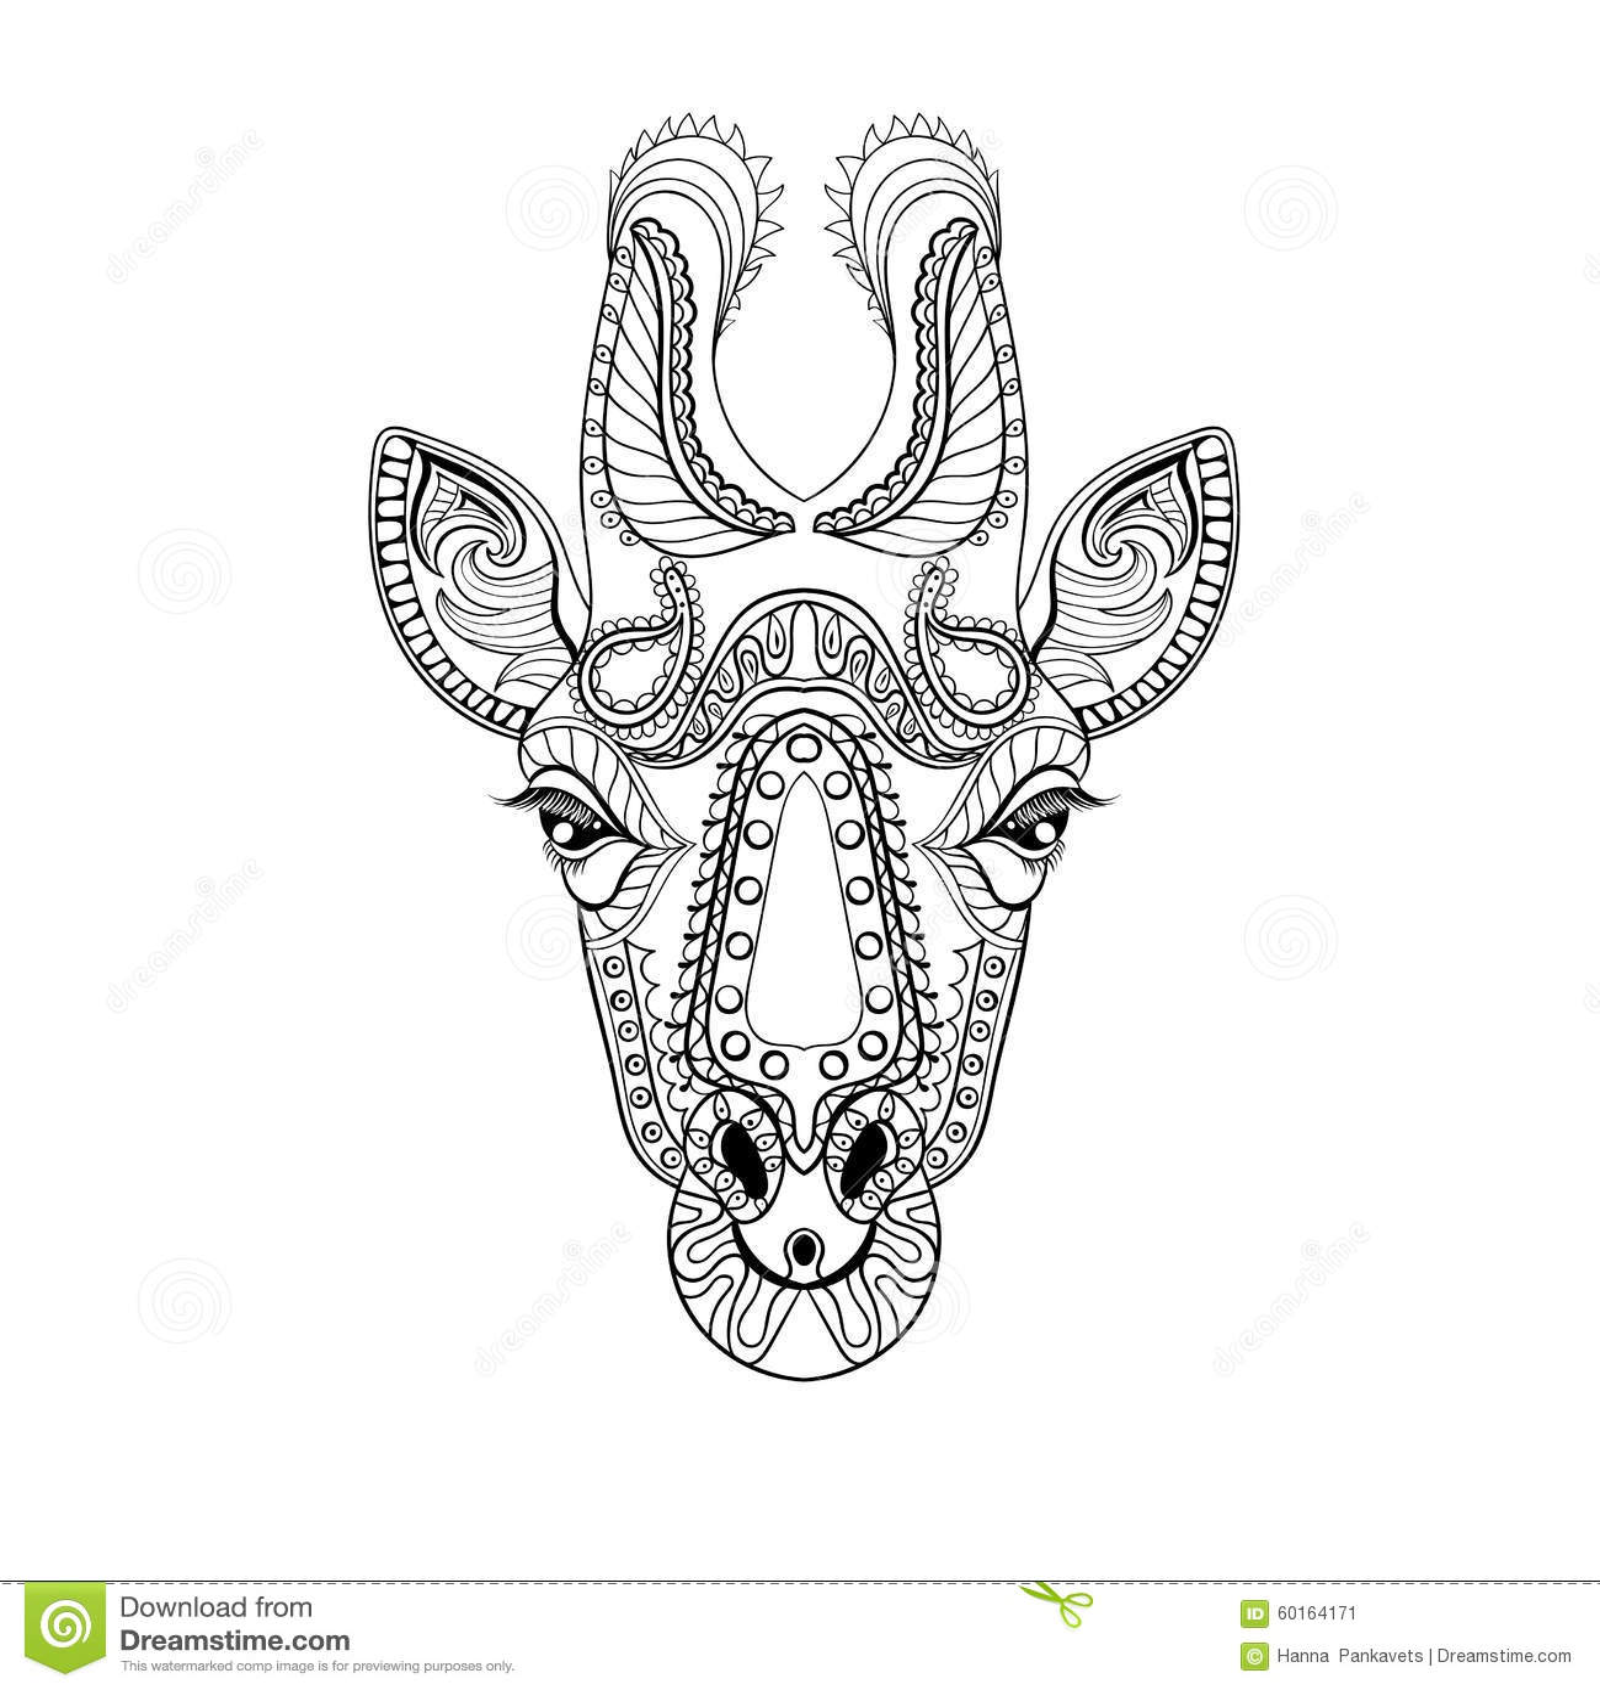 Zentangle Giraffe Head Totem For Adult Anti Stress